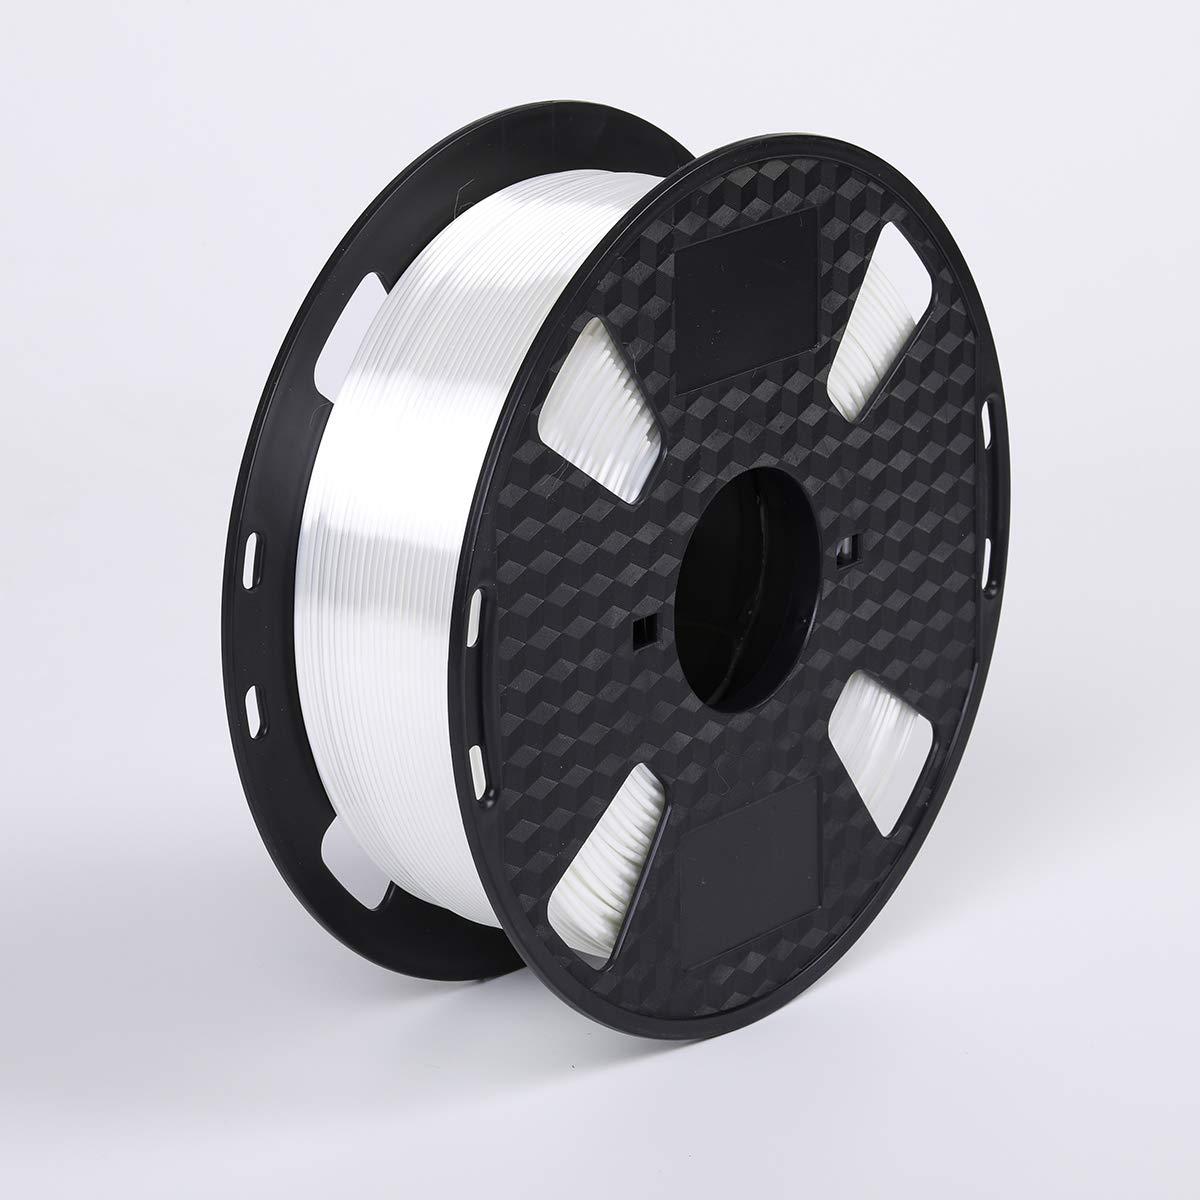 Shiny Pearl White 3D Printer Filament PLA 1.75 mm 1 KG (2.2 LBS) 3D Printing Shine Silk White PLA CC3D ZHUOPU